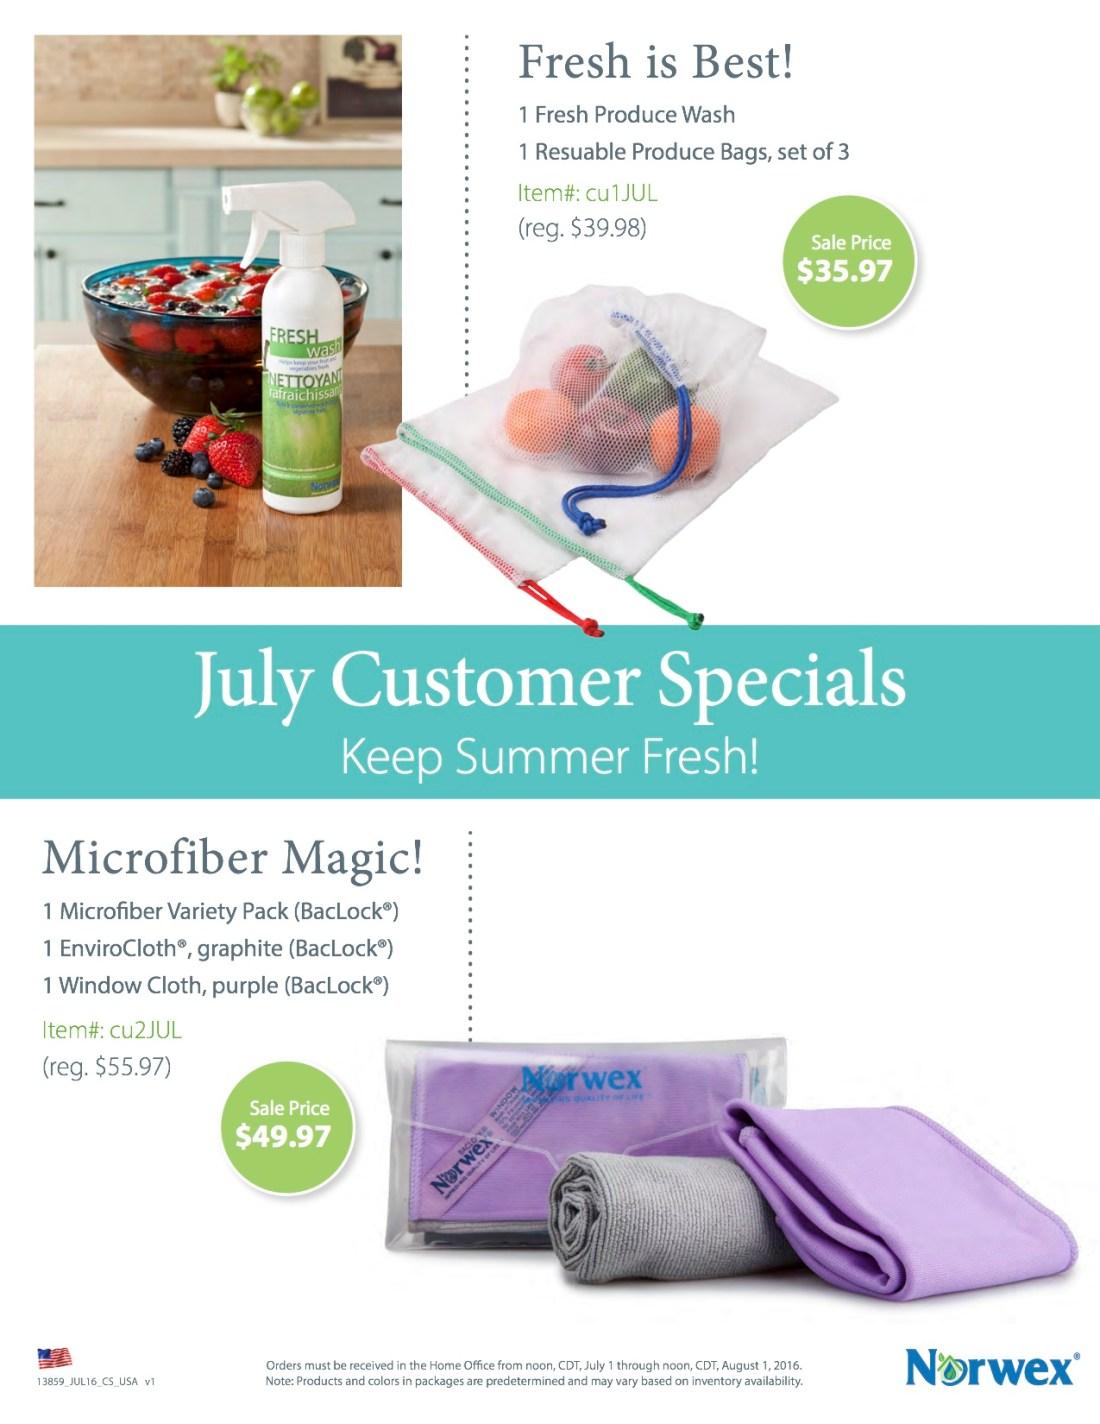 July16 Customer Special